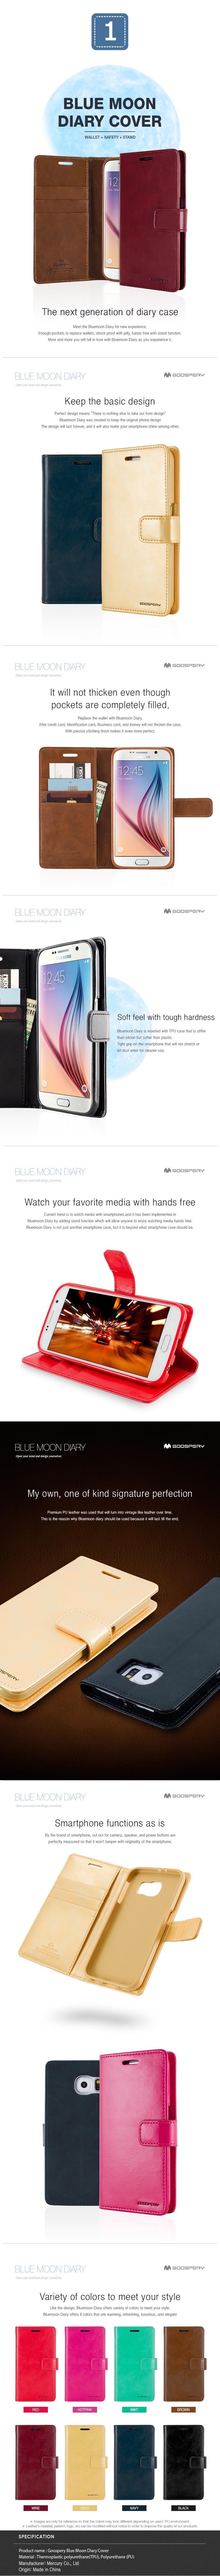 Buy Jdpremium Designer Stylegoospery Case Cover For Iphone Samsung Goospery Note 3 Blue Moon Diary Galaxy Grand Prime 8